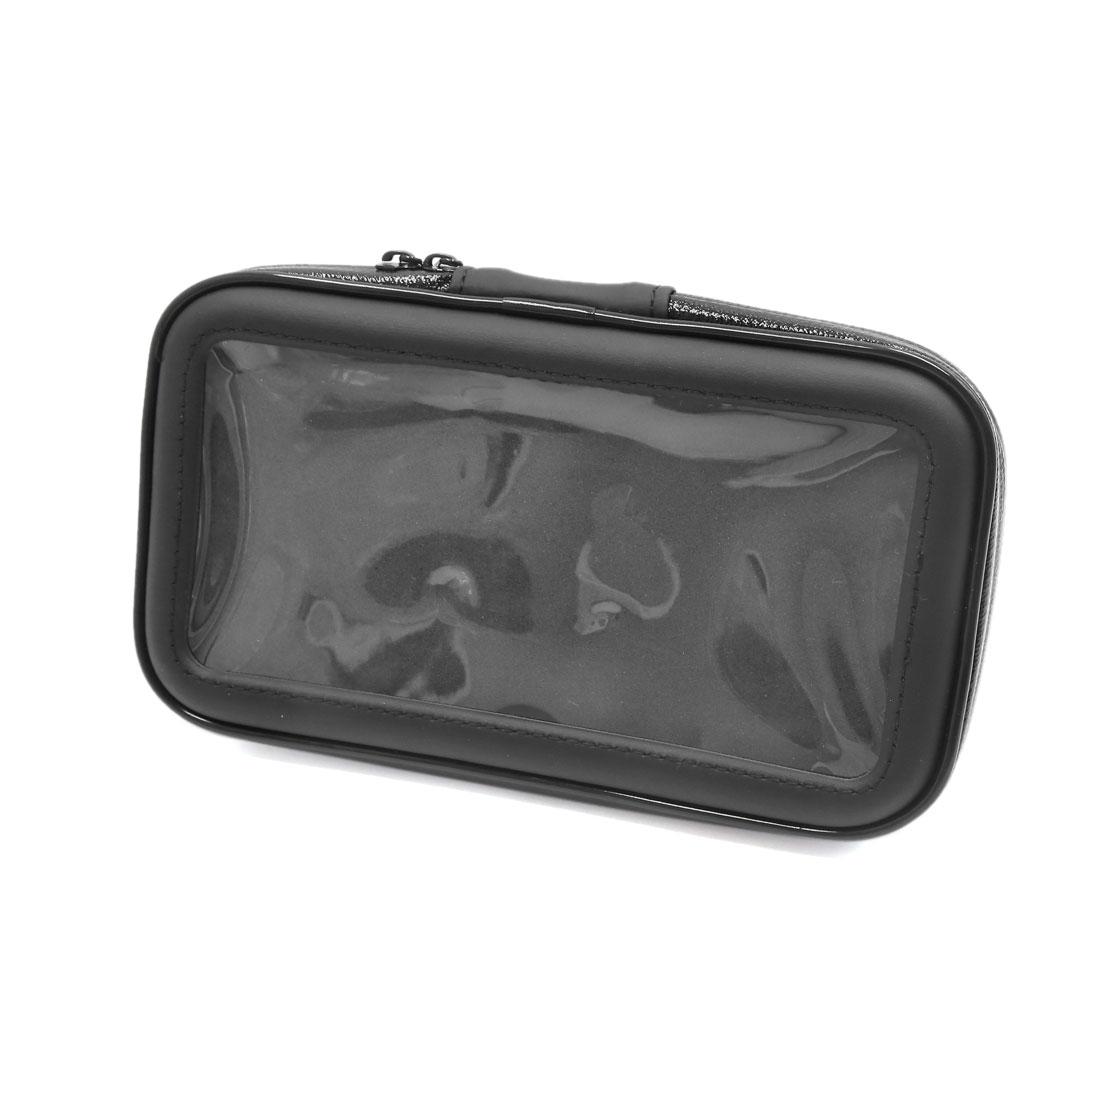 Black Bicycle Handlebar Mount Holder Waterproof Phone Bag Case 183 x 110 x 30mm